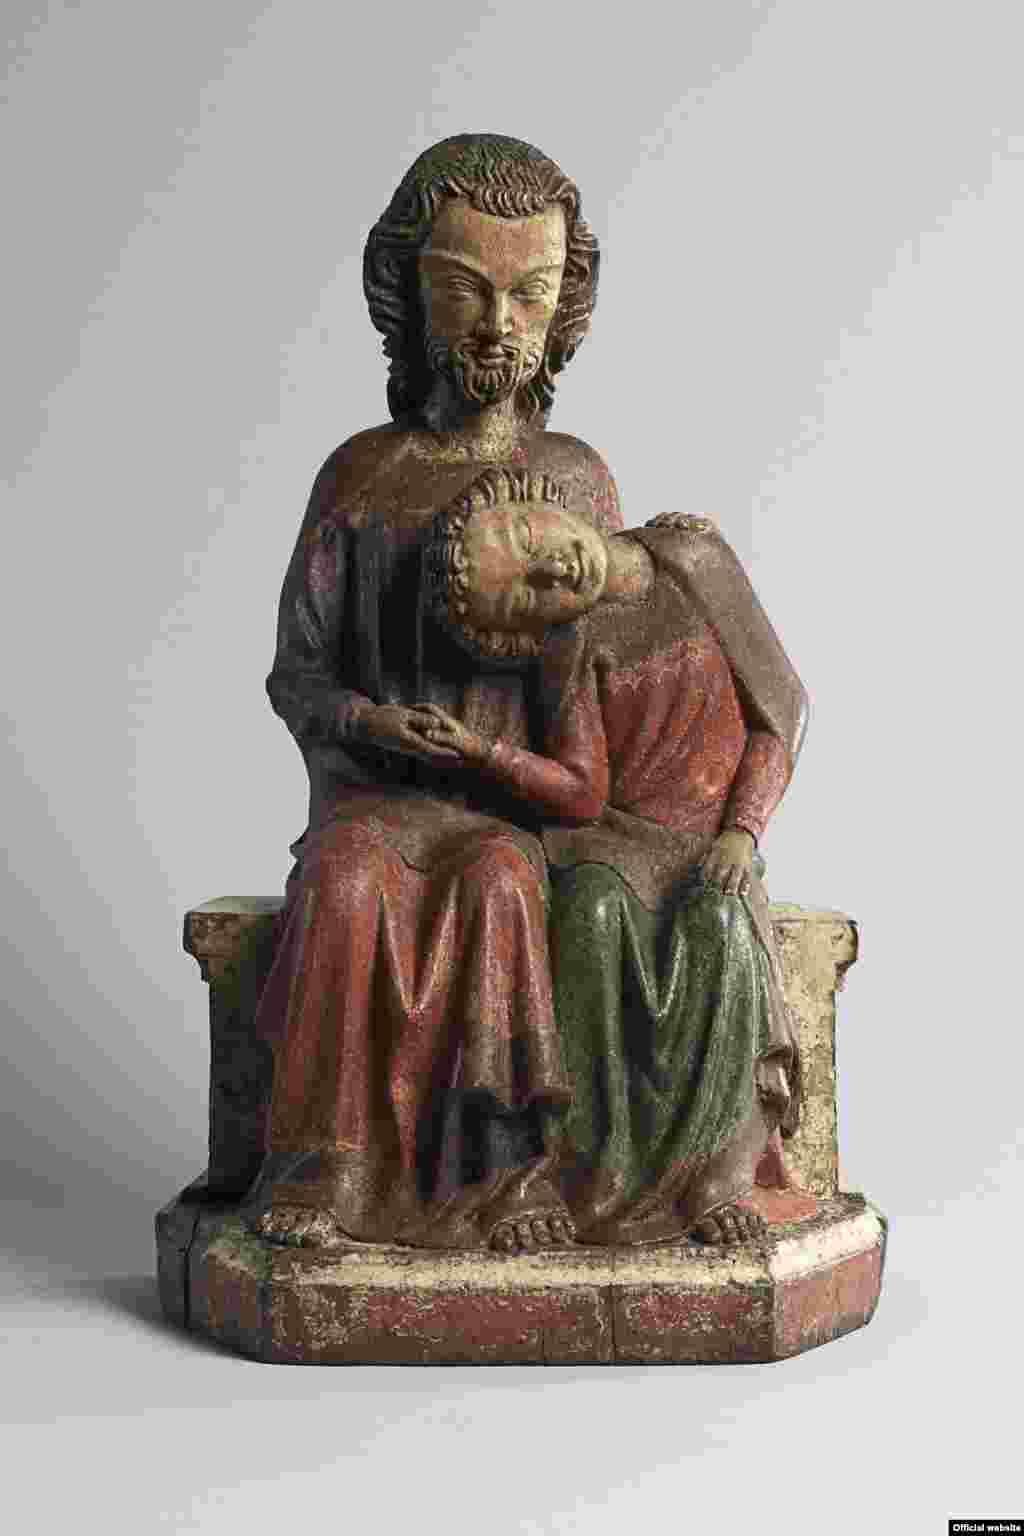 Cristos cu Sf. Ioan, din mânăstirea Adelhausen, Freiburg im Breisgau, regiunea Rinului superior sau a Lacului Constanța, cca. 1350 (Liebieghaus Skulpturensammlung, Frankfurt am Main Photo: Liebieghaus Skulpturensammlung – ARTOTHEK).